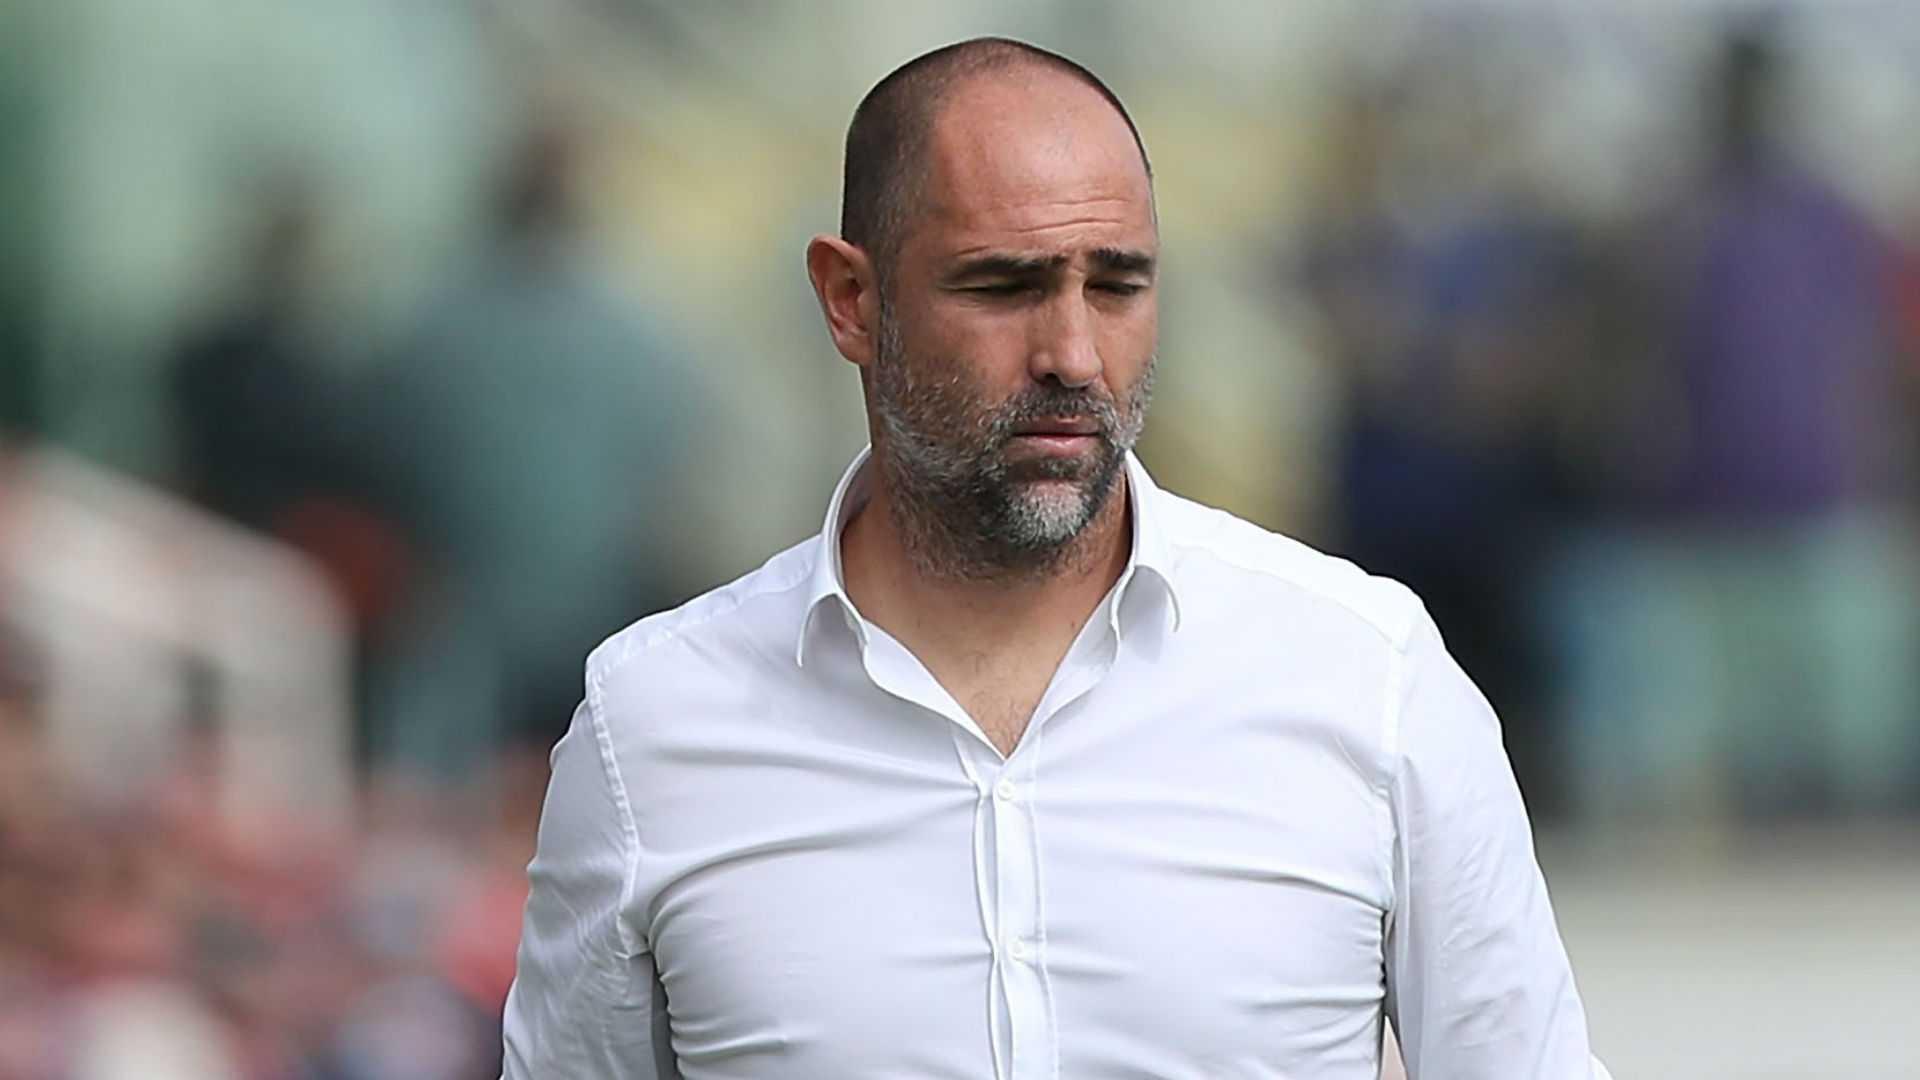 UFFICIALE - Hellas Verona, per Di Francesco è già esonero